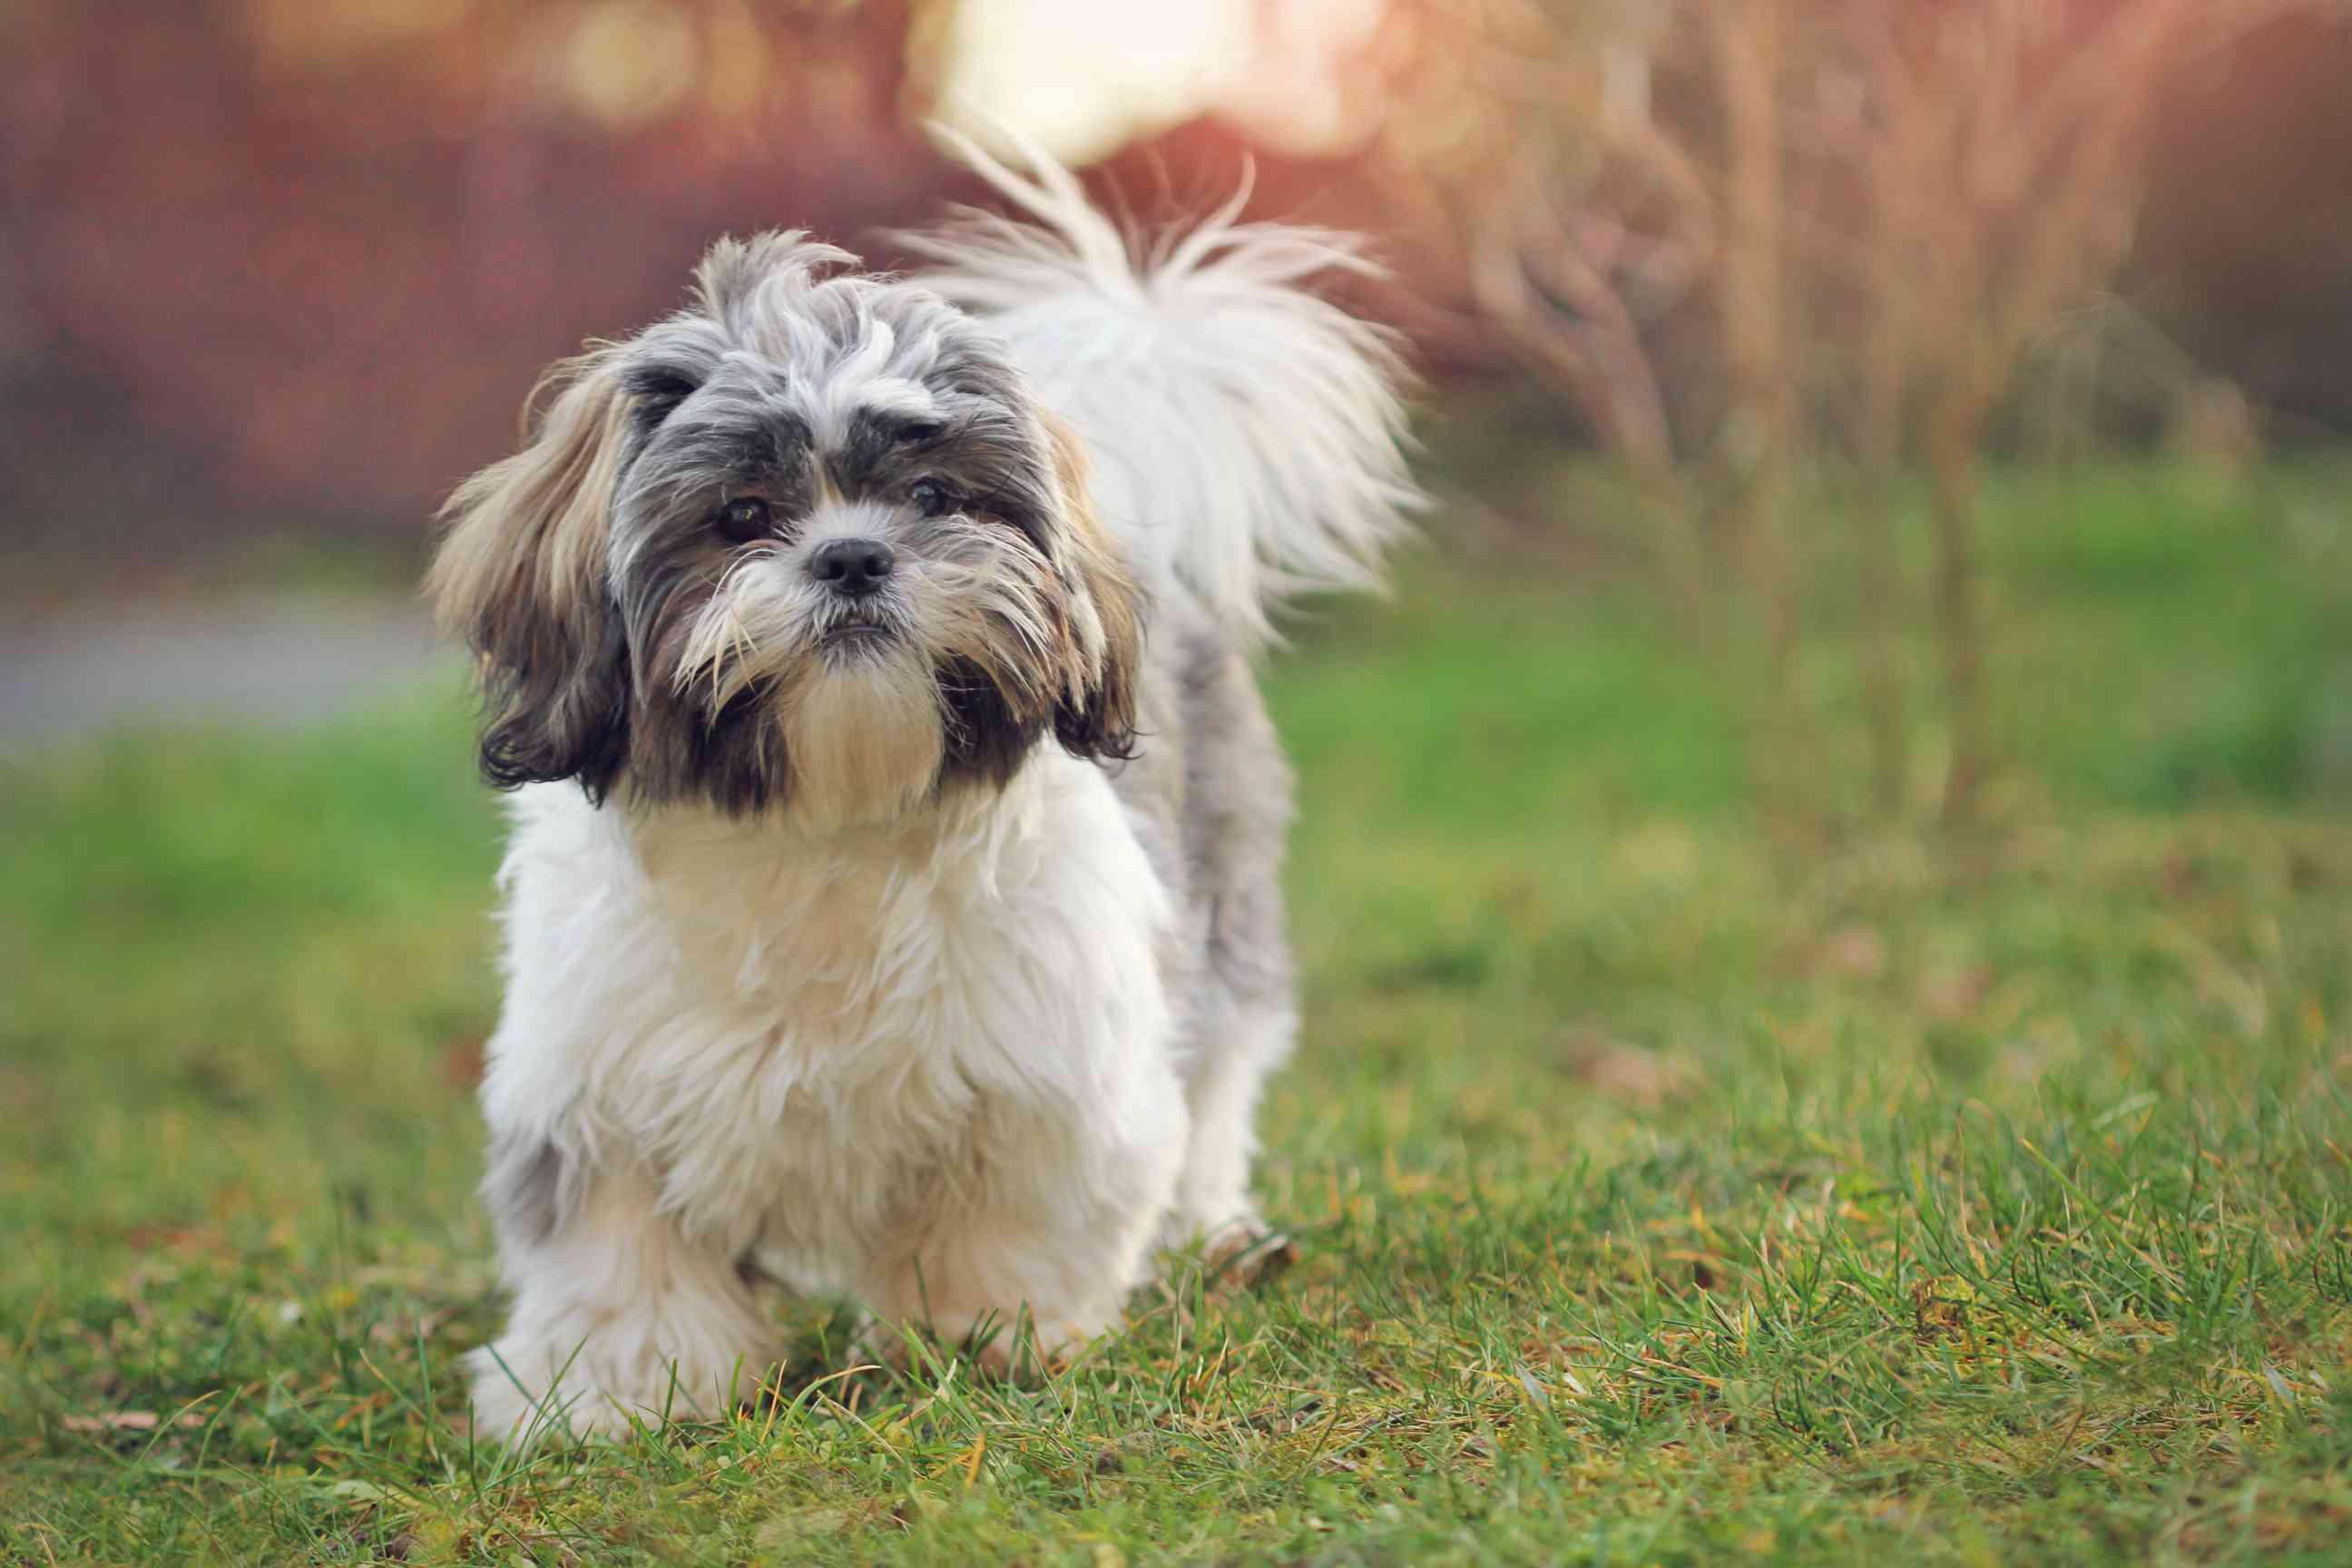 A small, shaggy Shih Tzu dog running in the grass.